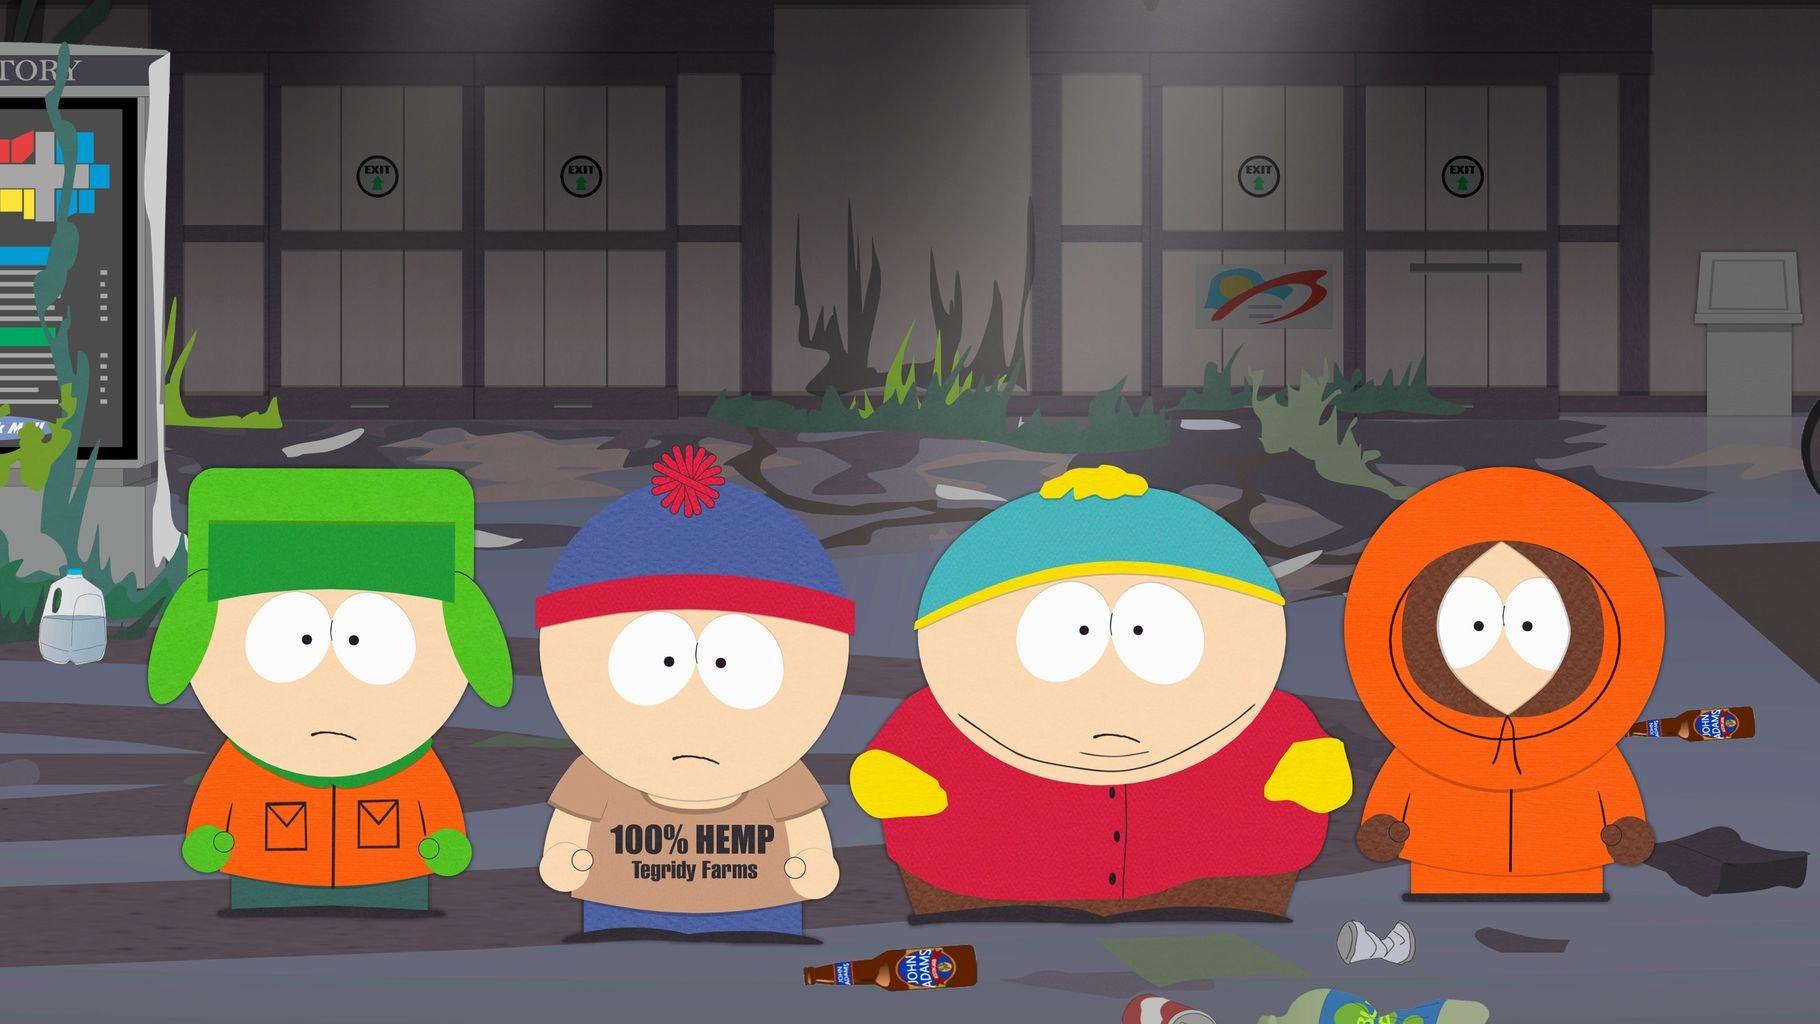 Southpark New Season 2020 When Does 'South Park' Come Back? Trey Parker & Matt Stone Will